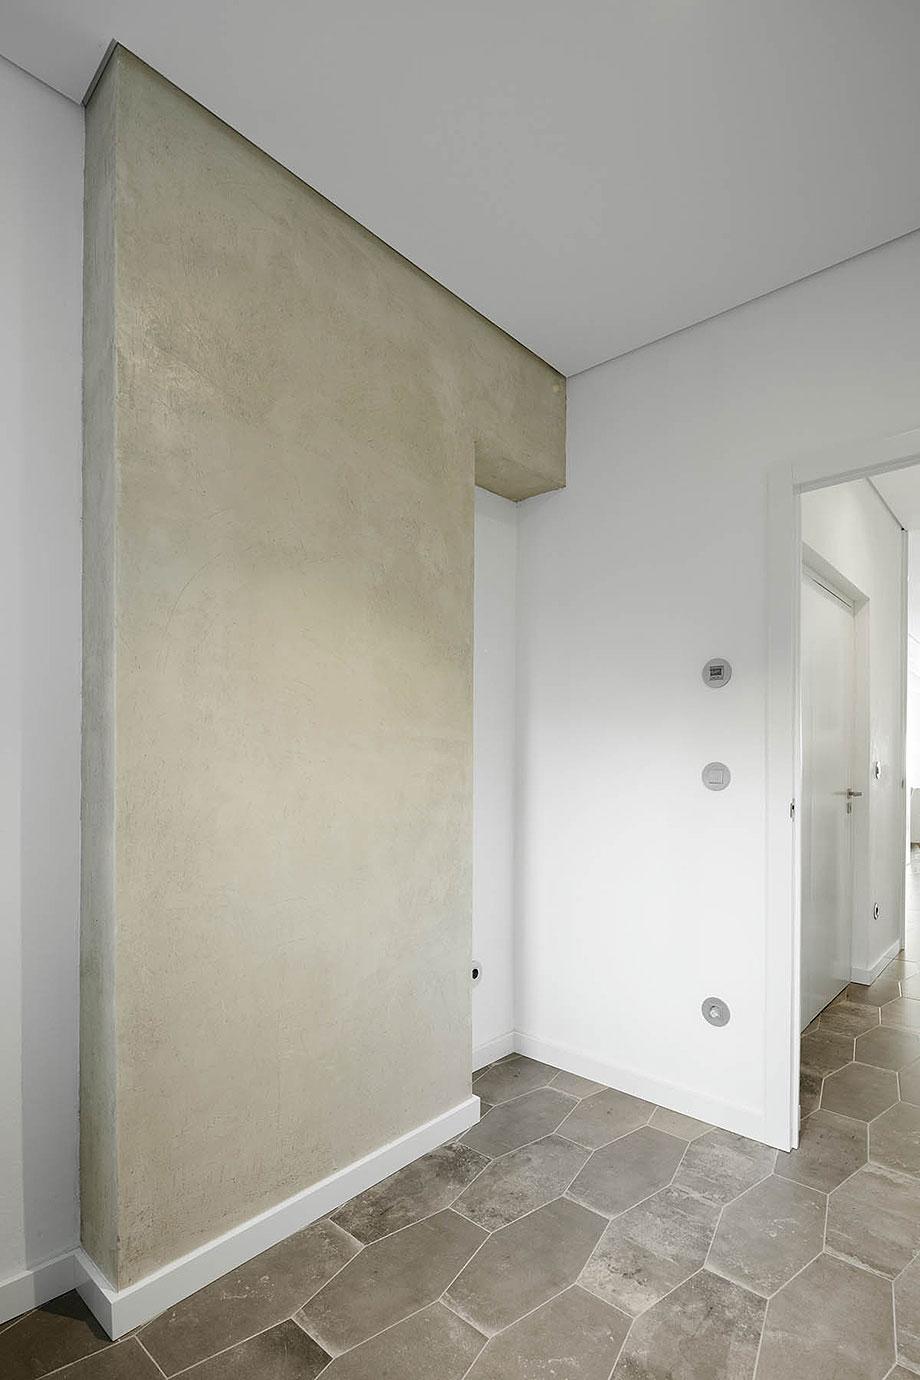 apartamento en oporto por paulo moreira architectures (12) - foto ivo tavares